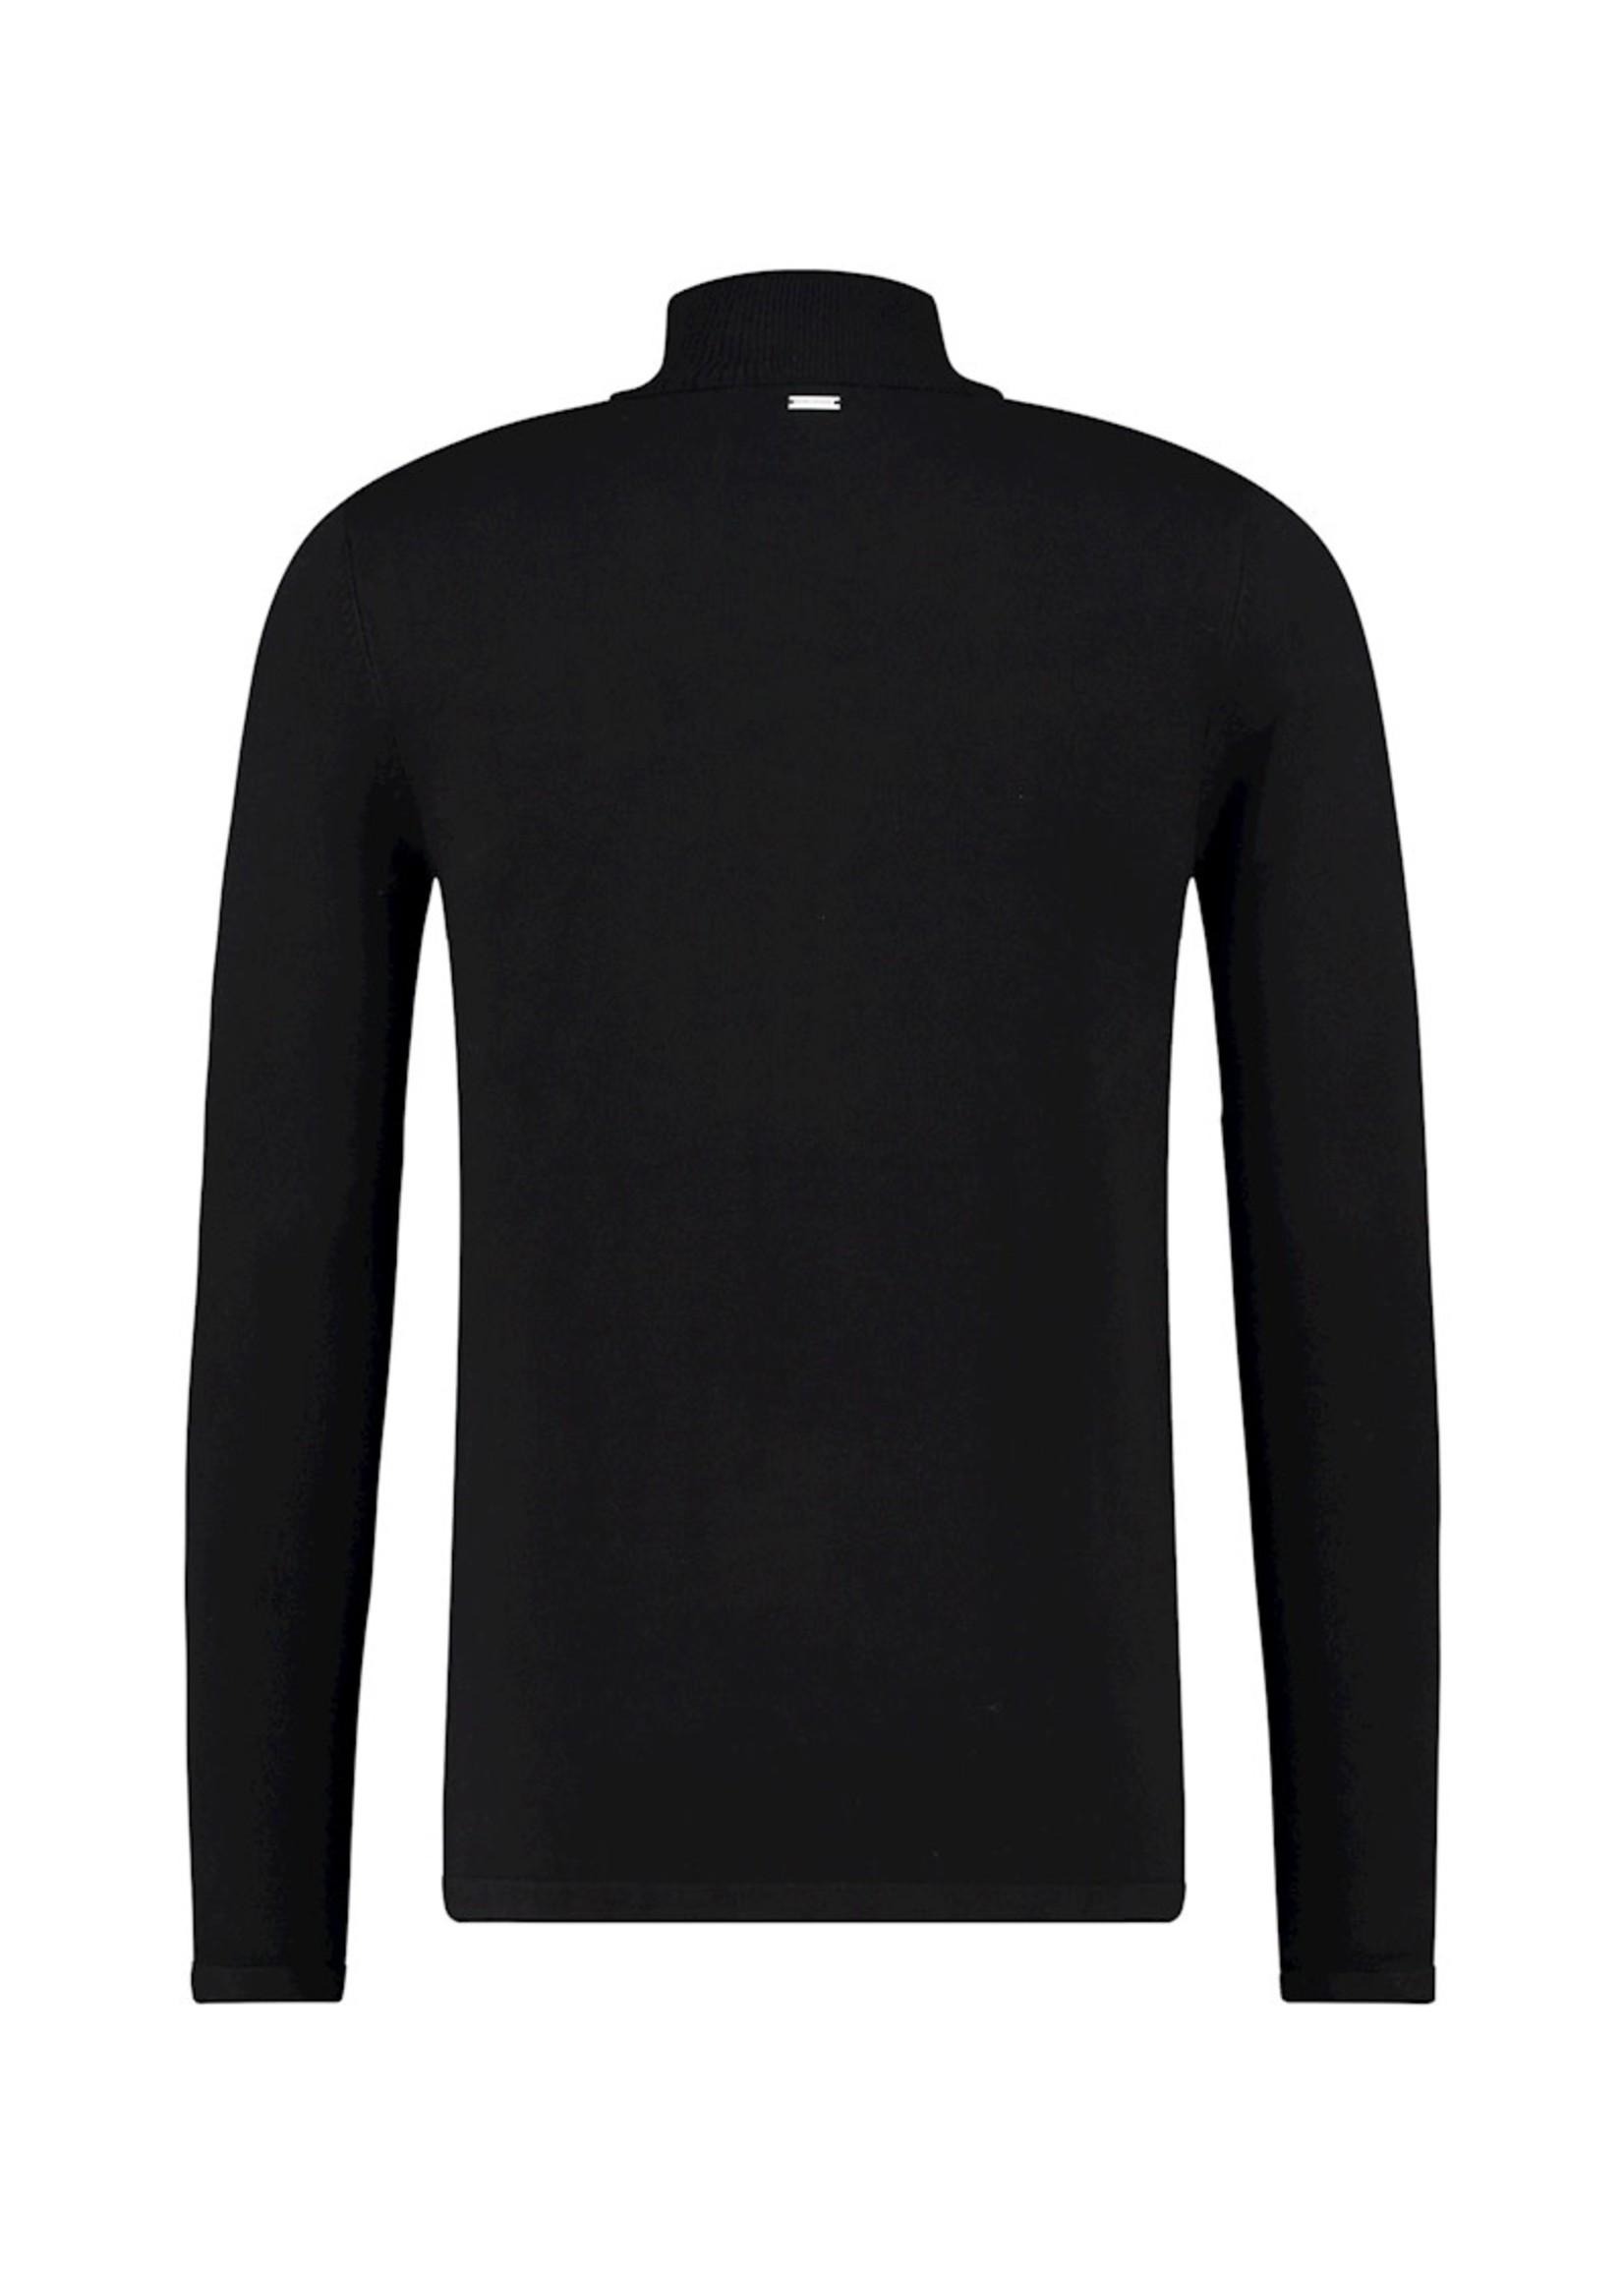 Purewhite Purewhite Knit Turtleneck - Black